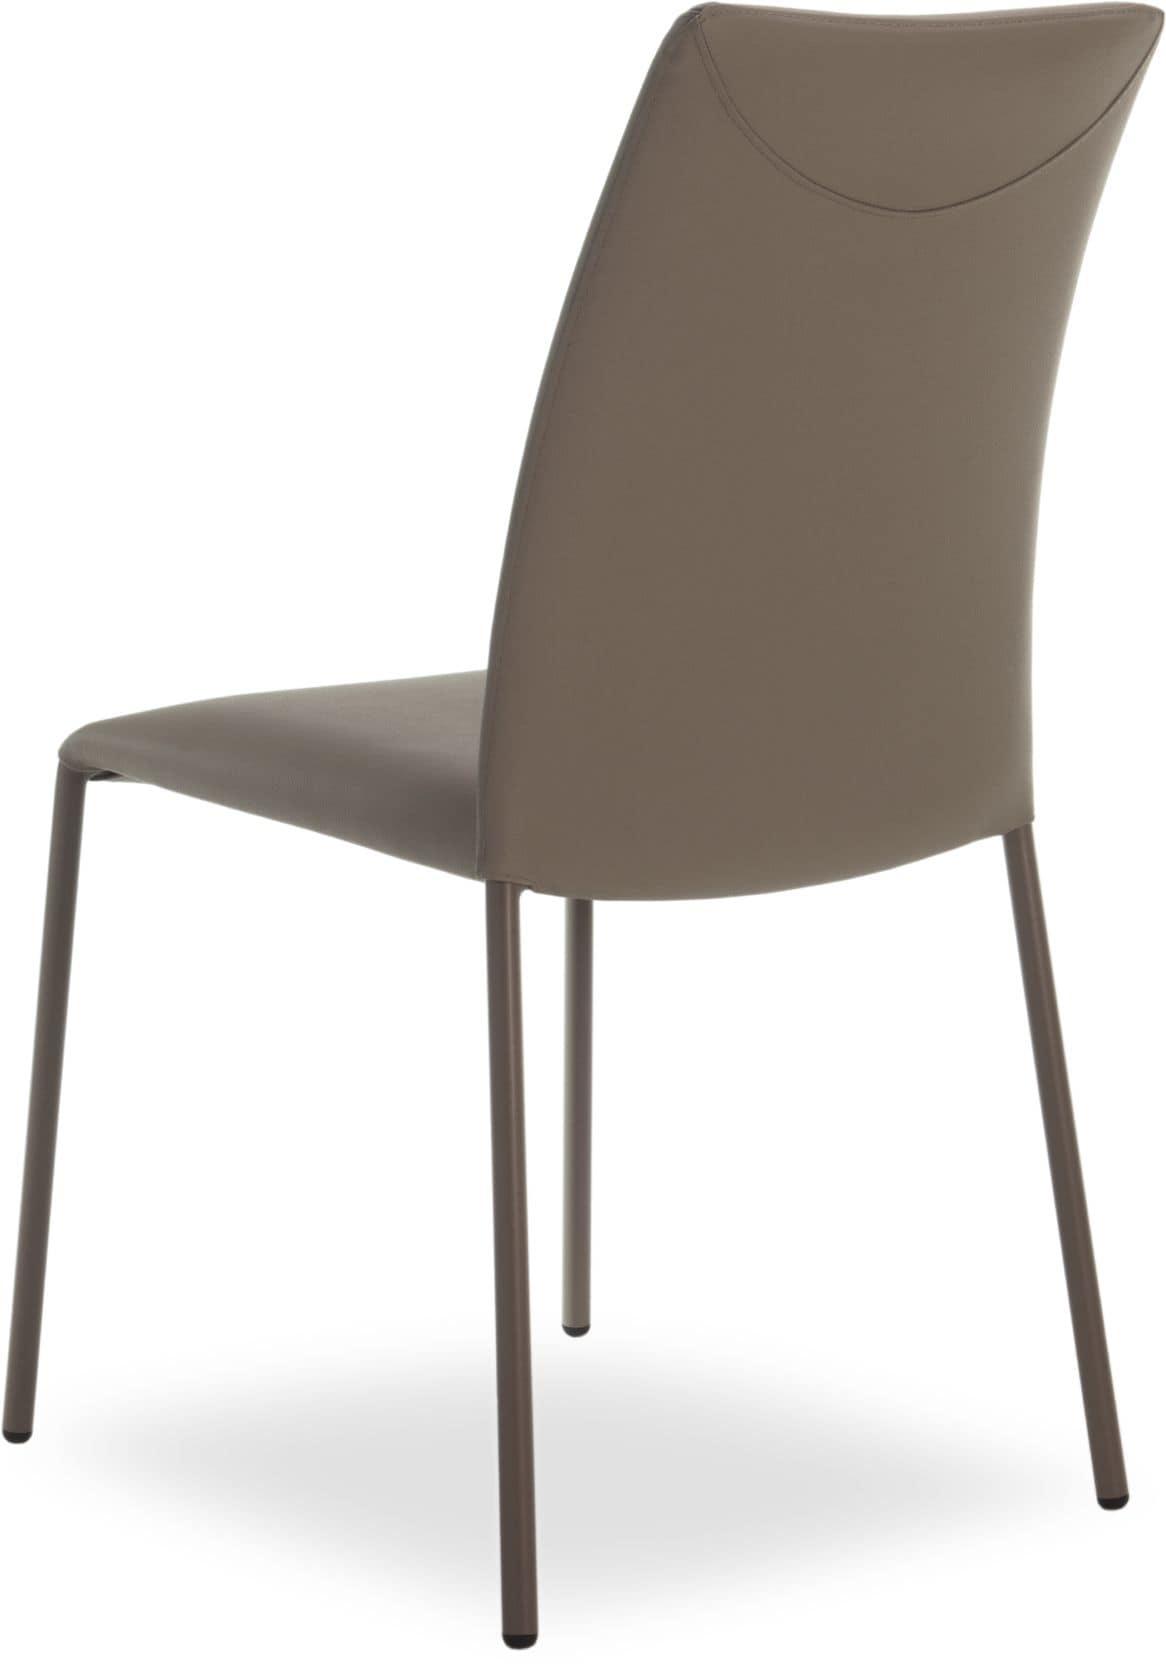 Design Stuhl Bauhaus Bauhaus Sofa House Decor